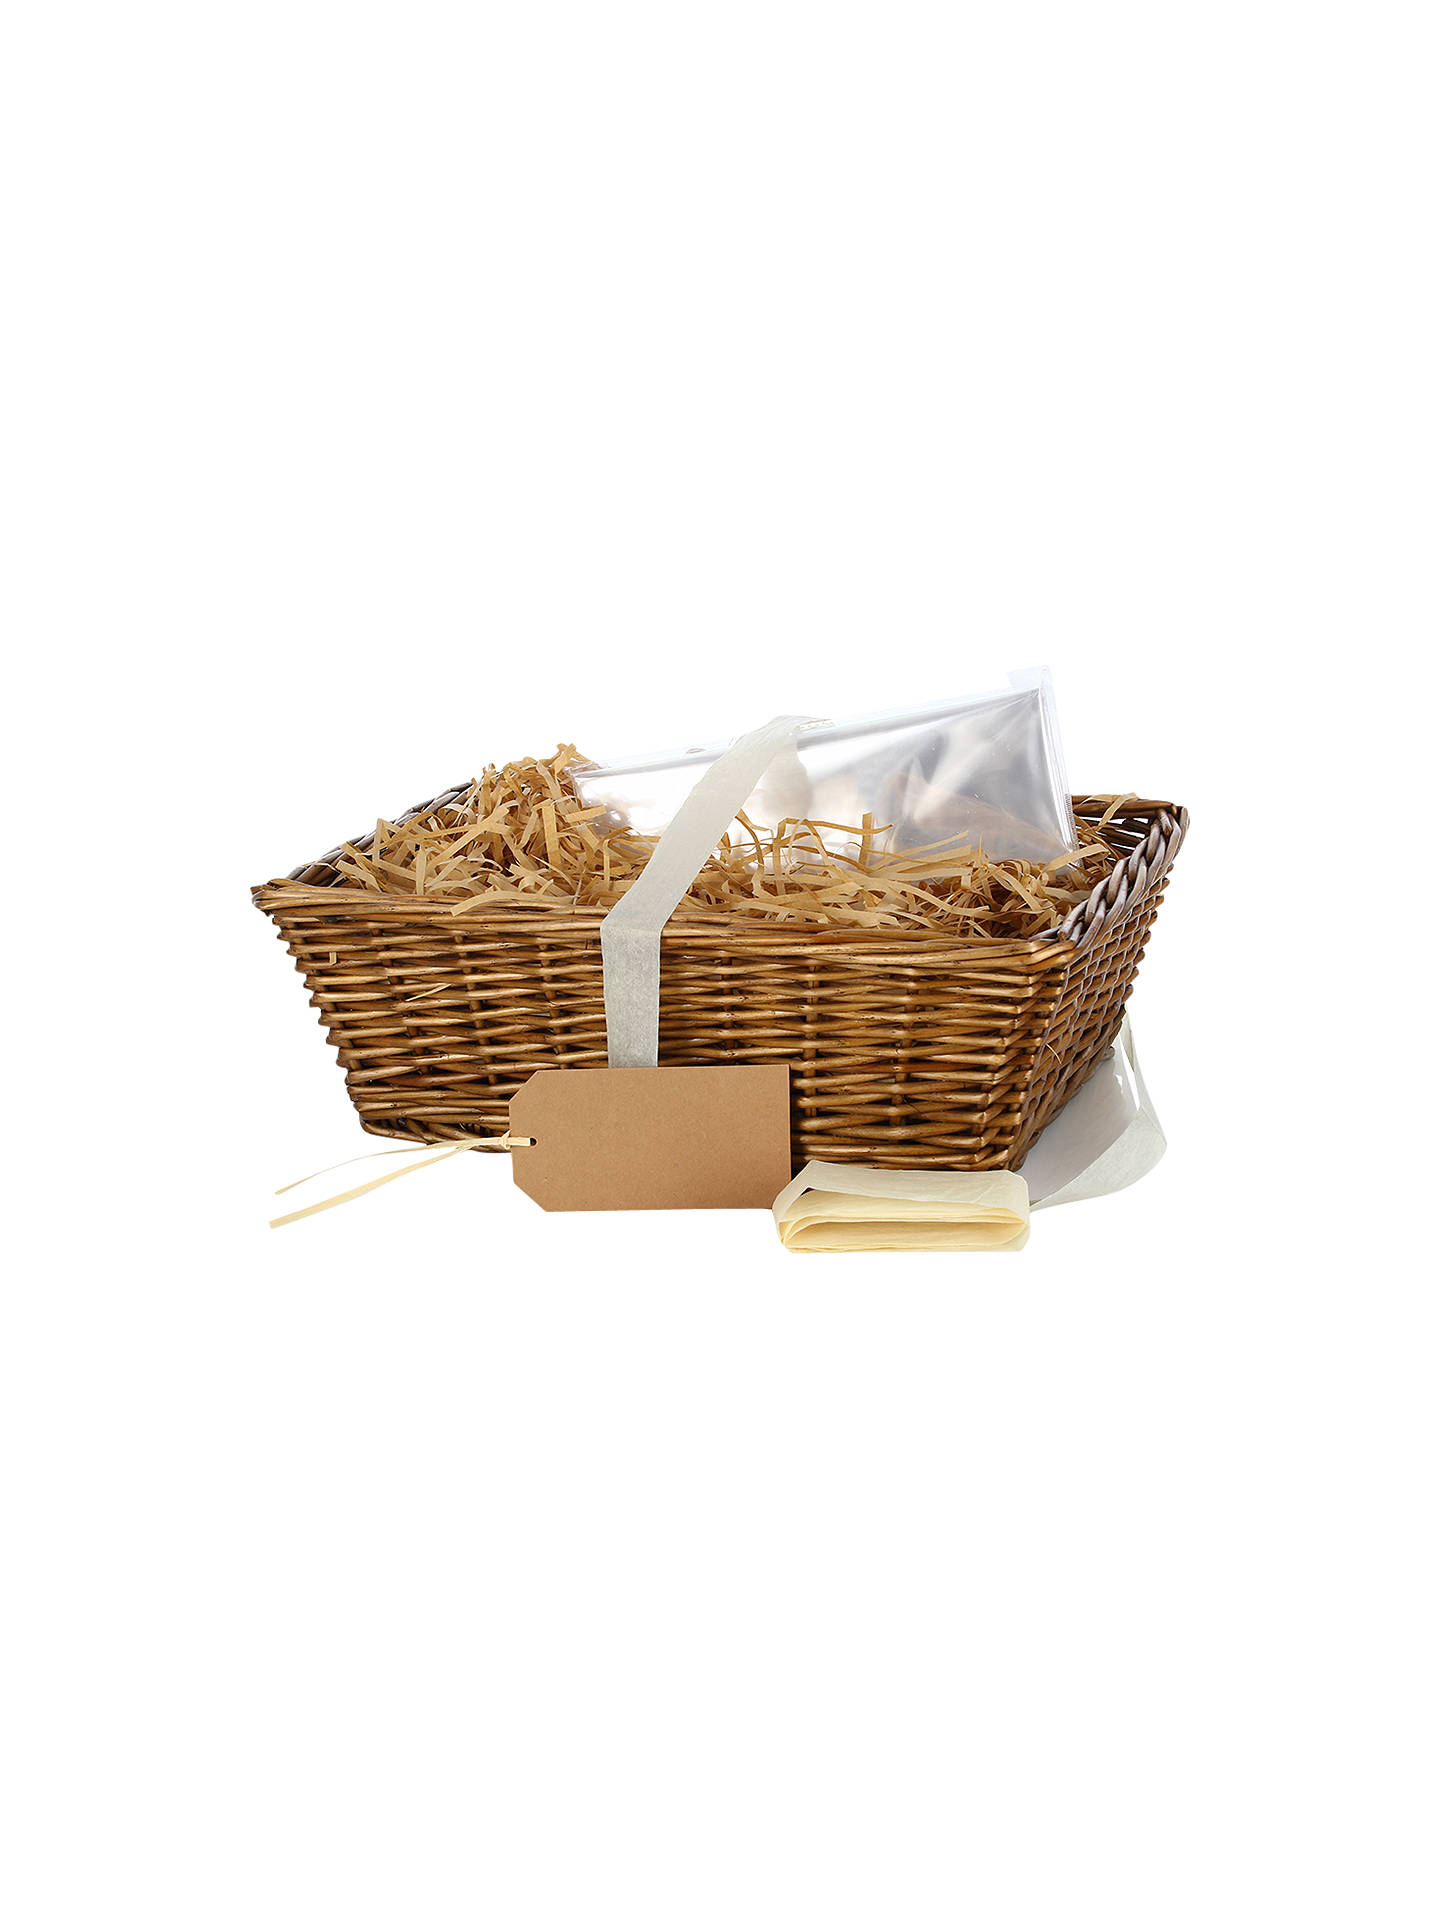 Xmas Christmas Gift Storage Wicker Basket Hamper With Lining Baby Shower Present